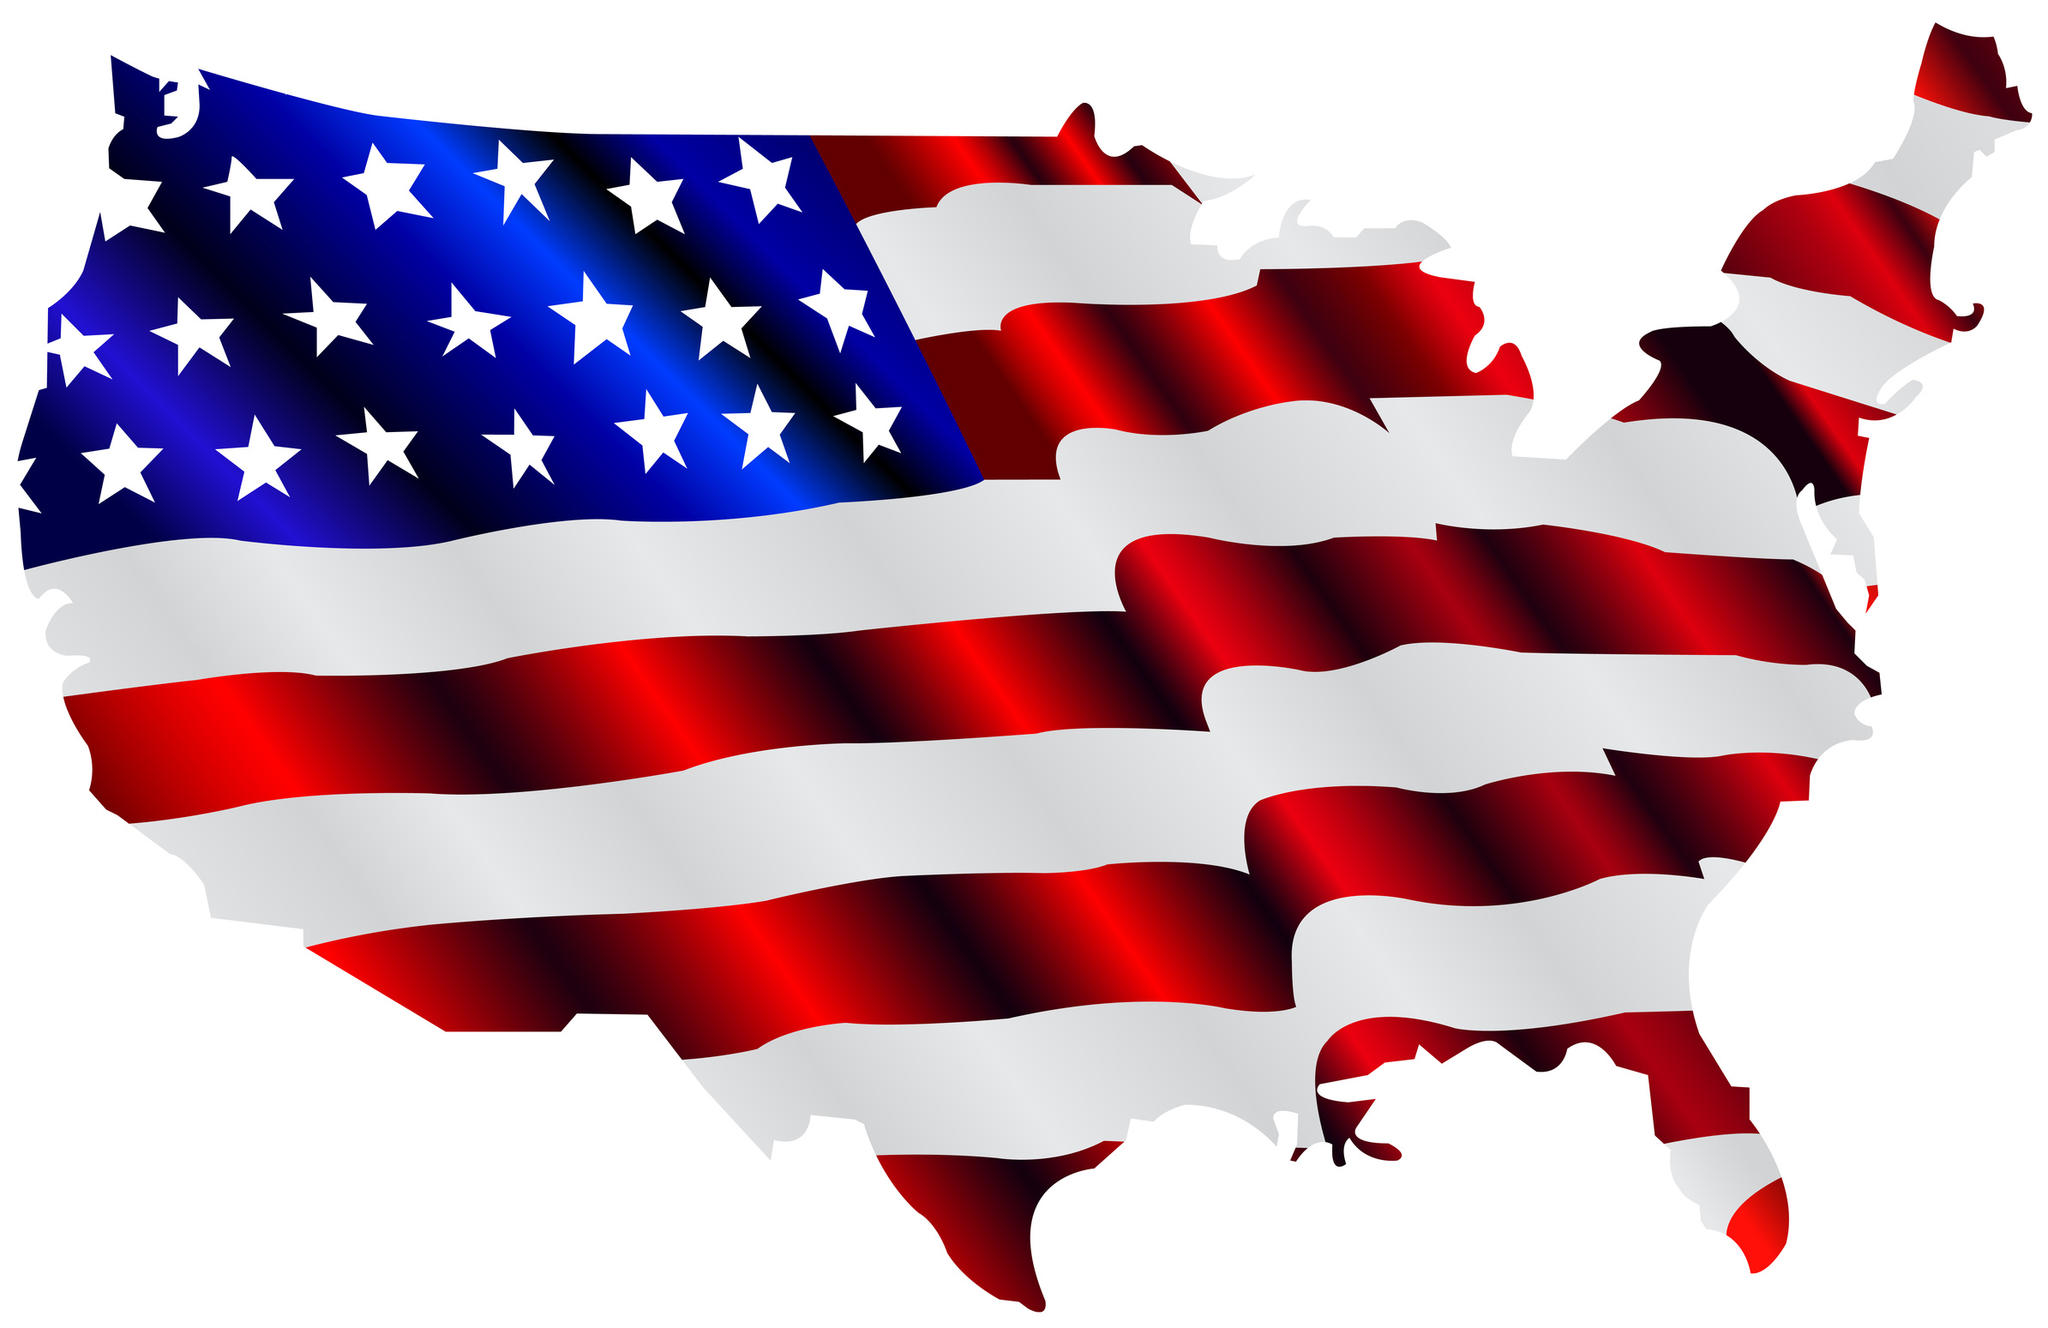 United States Map Desktop Wallpaper WallpaperSafari - Hd us map background